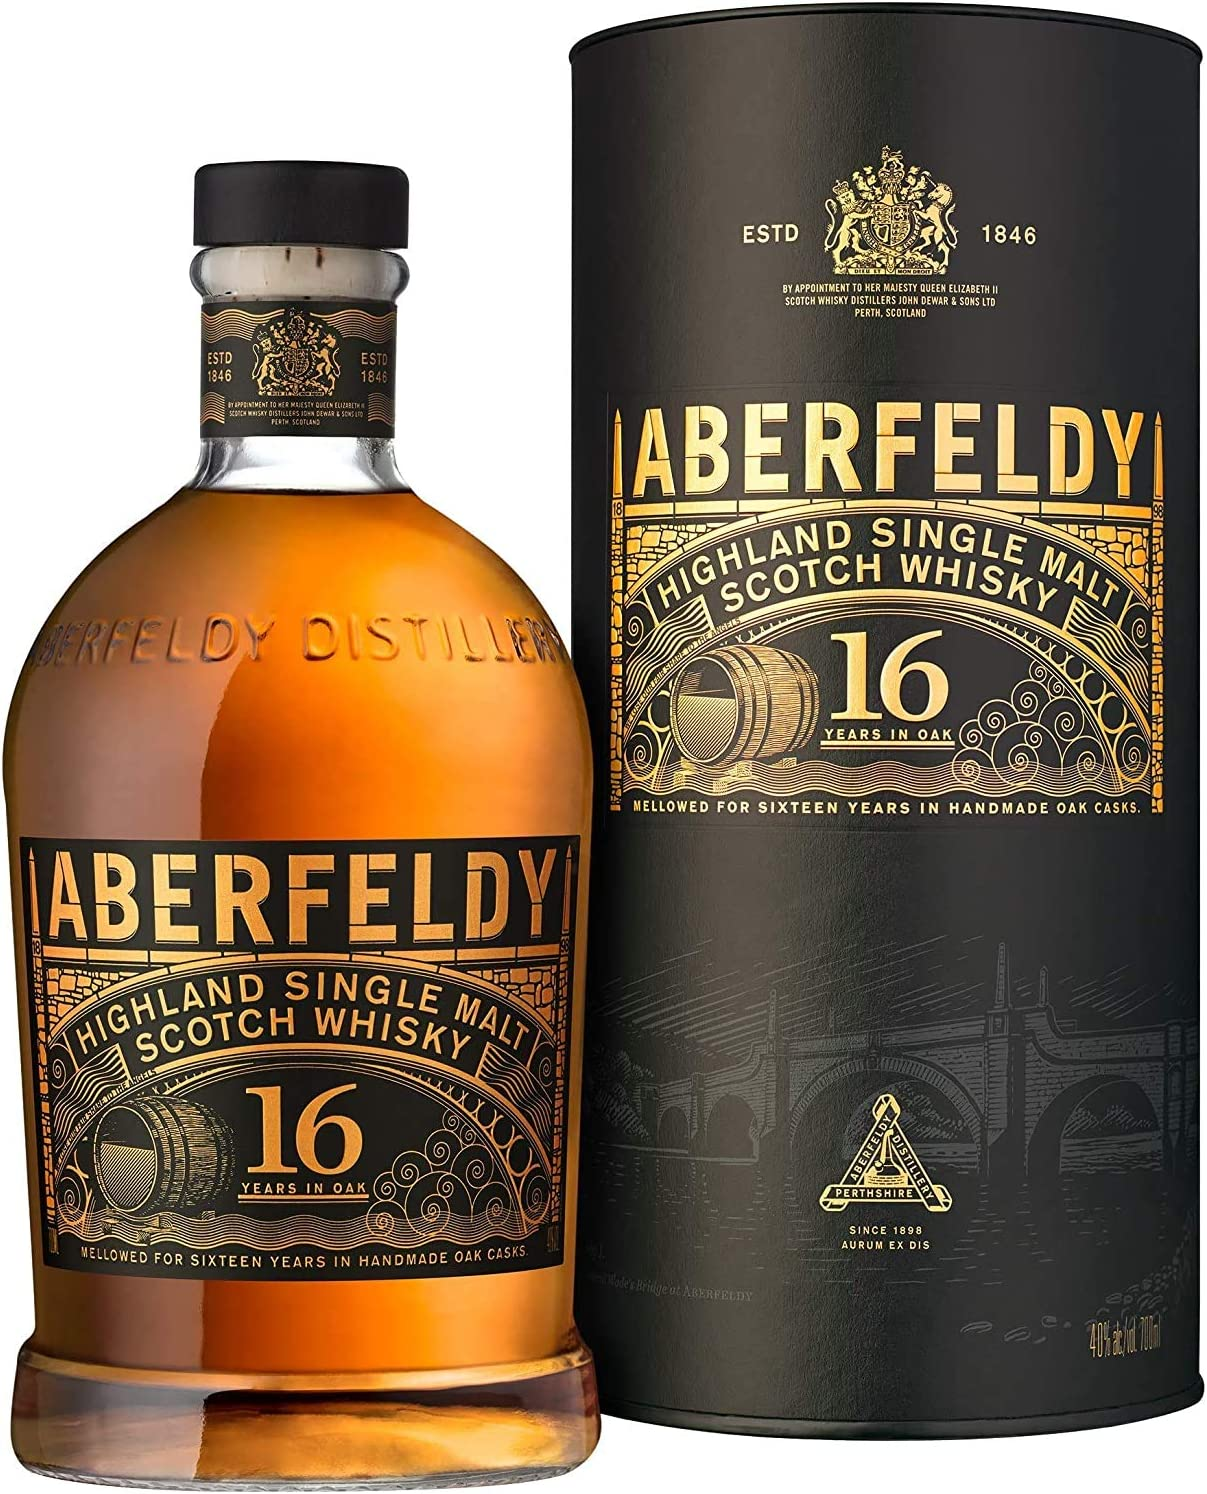 Aberfeldy Highland Single Malt Whisky 16 Jahre